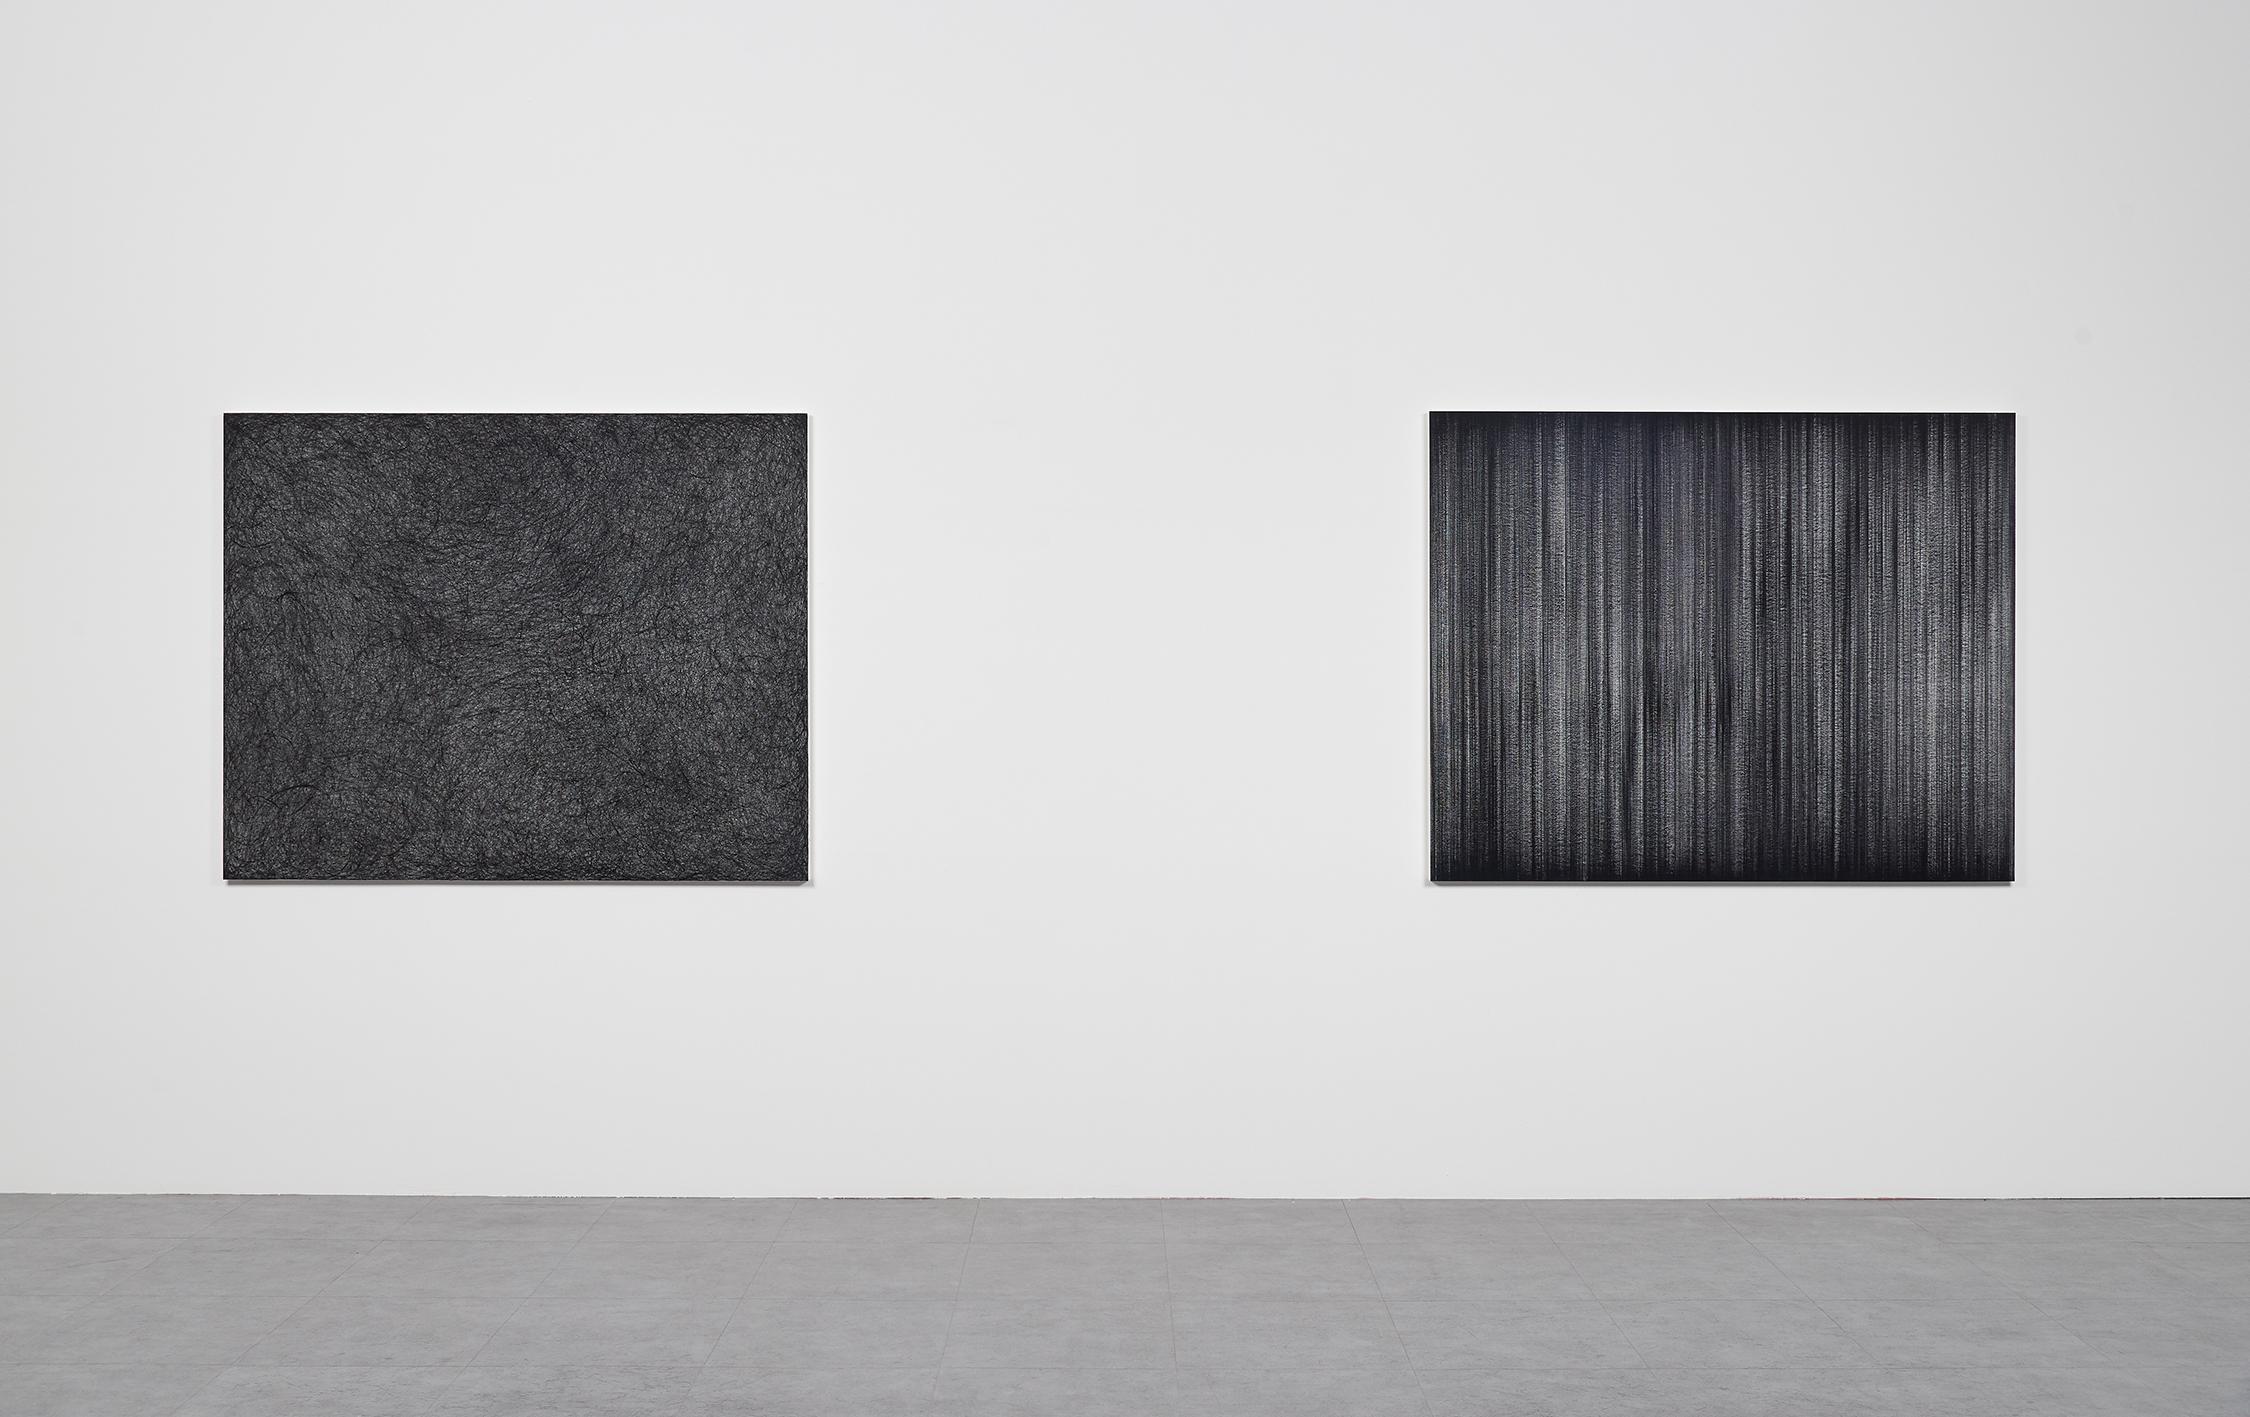 (Left) EunHye Kang | Fogginess | Sumi-ink Drawing on Rice Paper | 120x150(cm) | 2018  (Right) EunHye Kang | Stillness | Sumi-ink Drawing on Rice Paper | 120x150(cm) | 2018